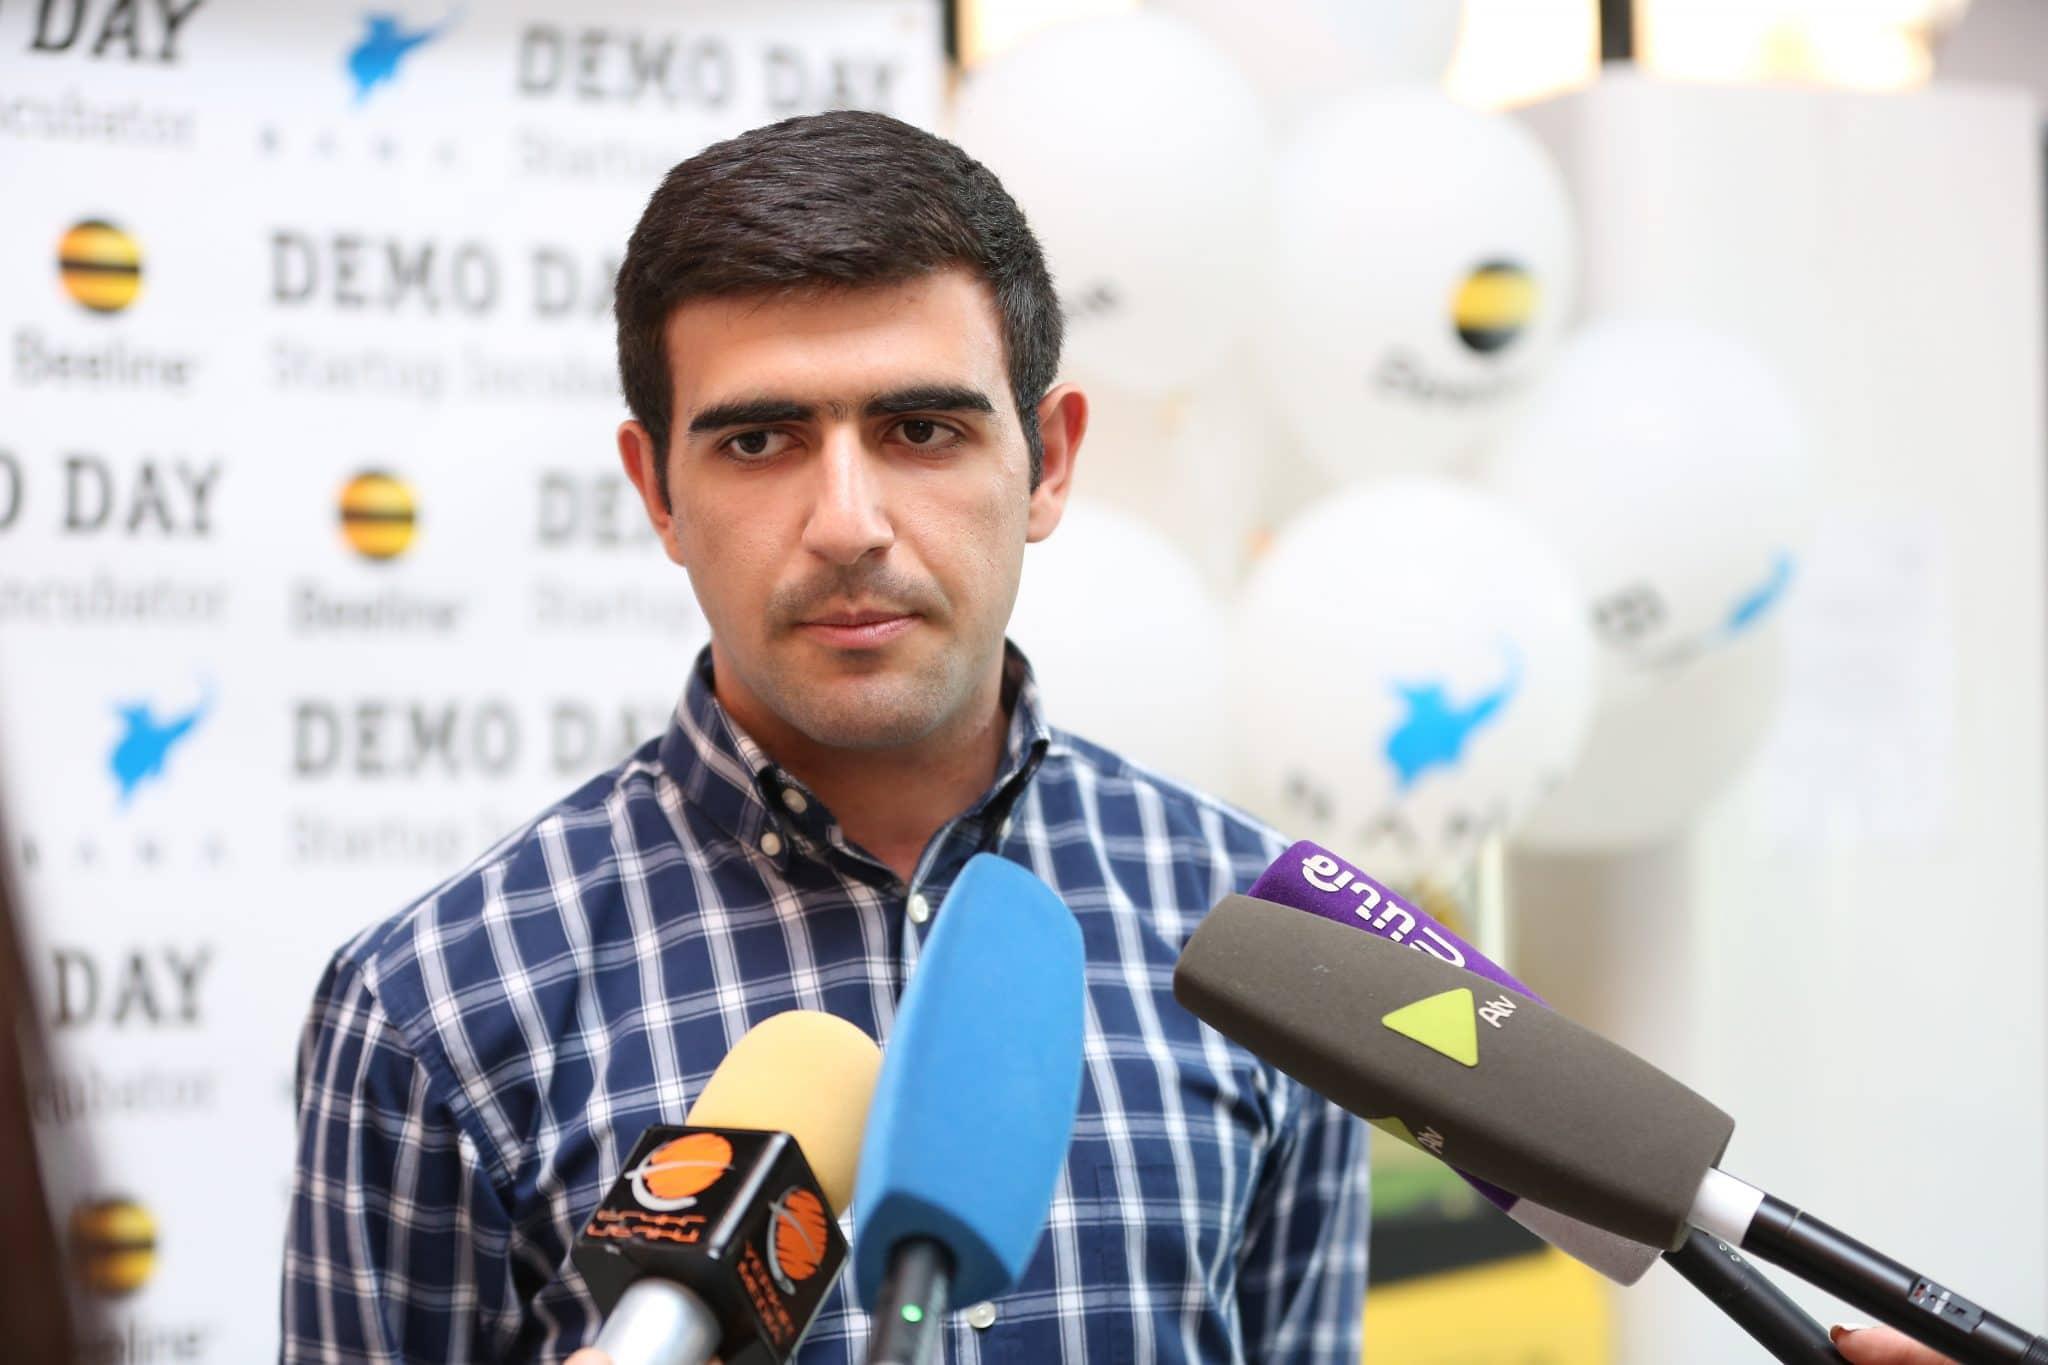 Erik Khachatryan GlobalR